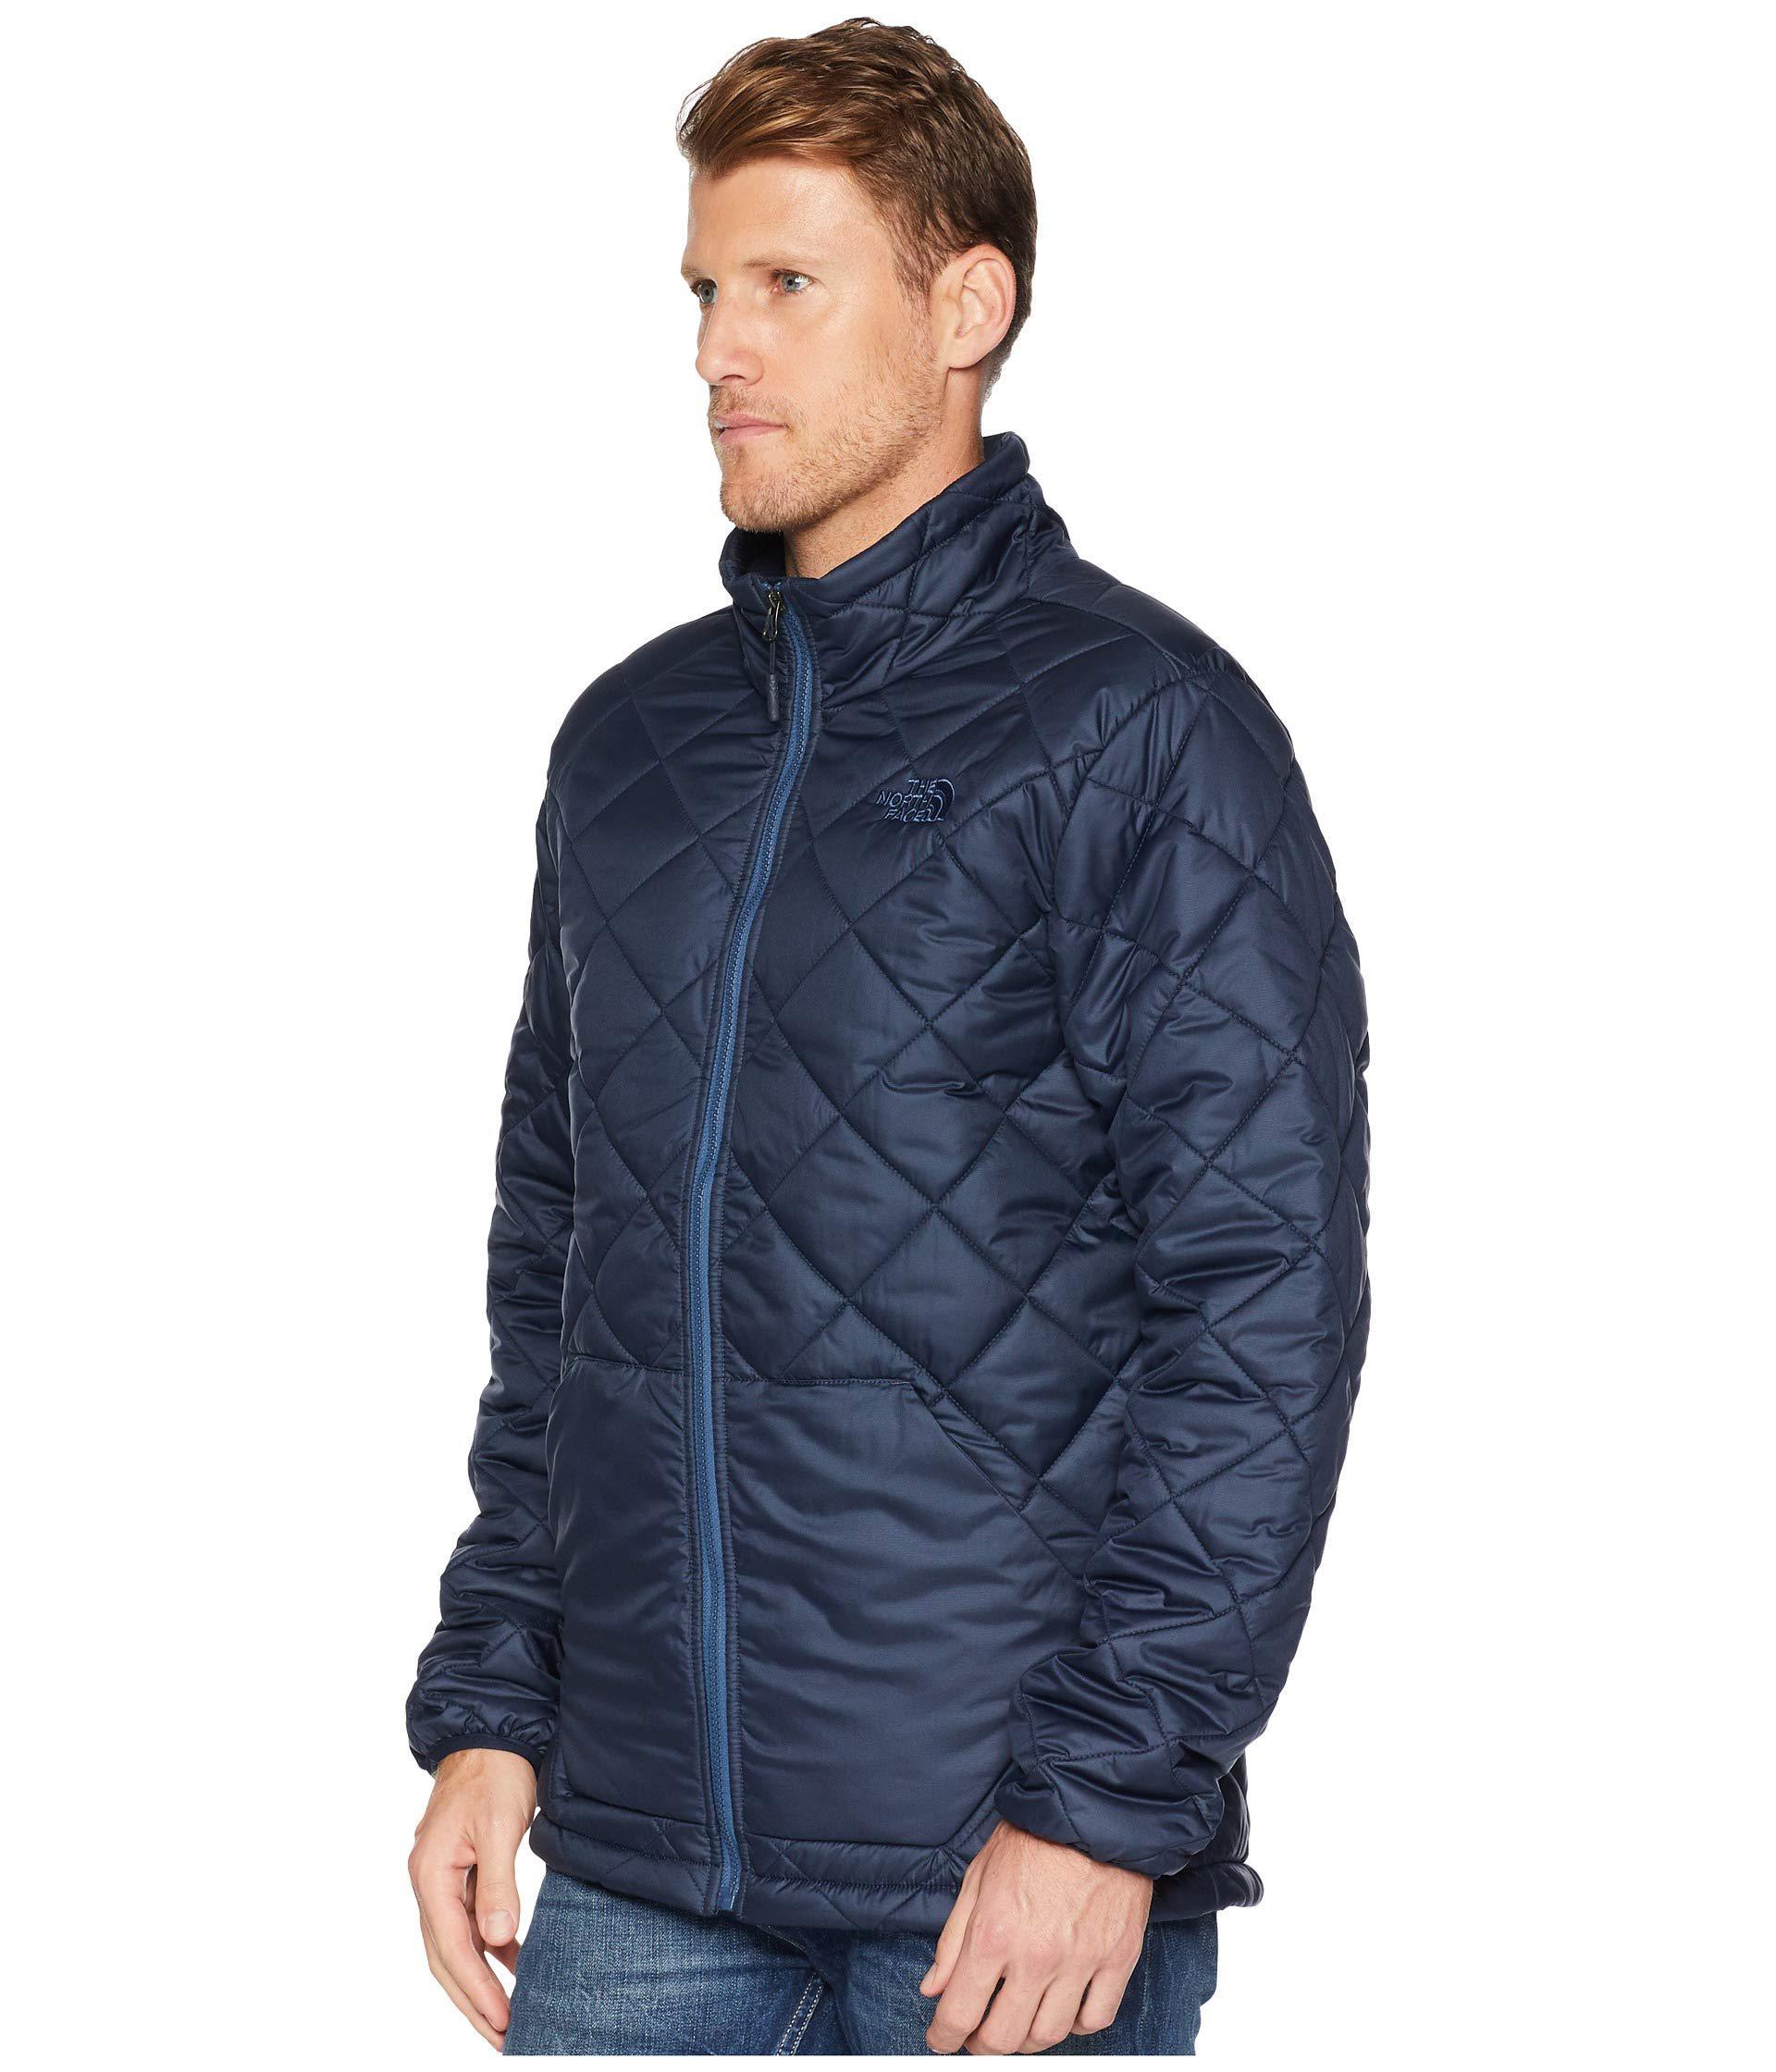 ... denmark lyst the north face cervas jacket urban navy mens coat in blue  for men f4f52 5e6e39f7b